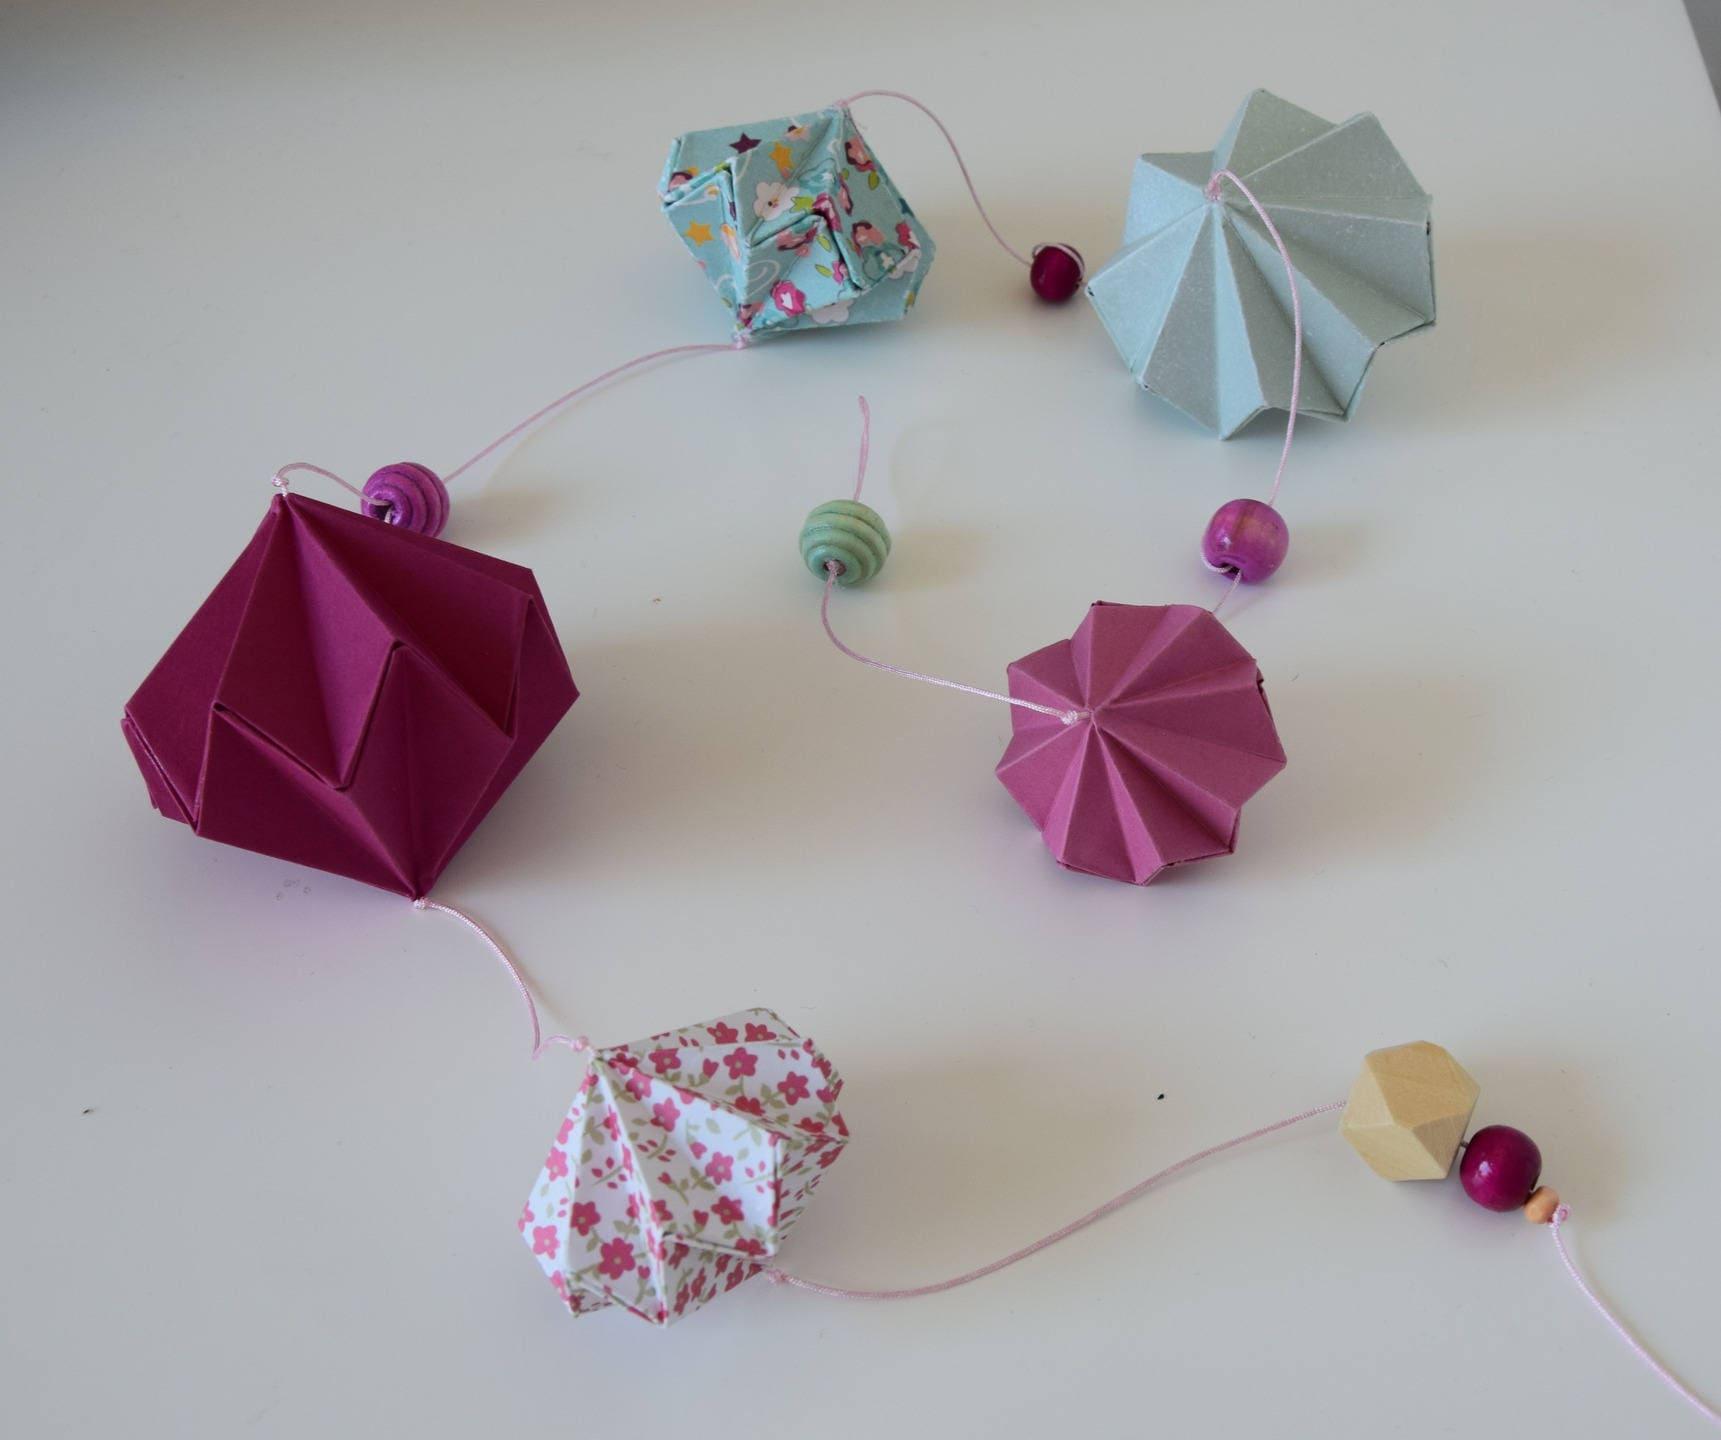 guirlande origami diamant d coration murale fille etsy. Black Bedroom Furniture Sets. Home Design Ideas